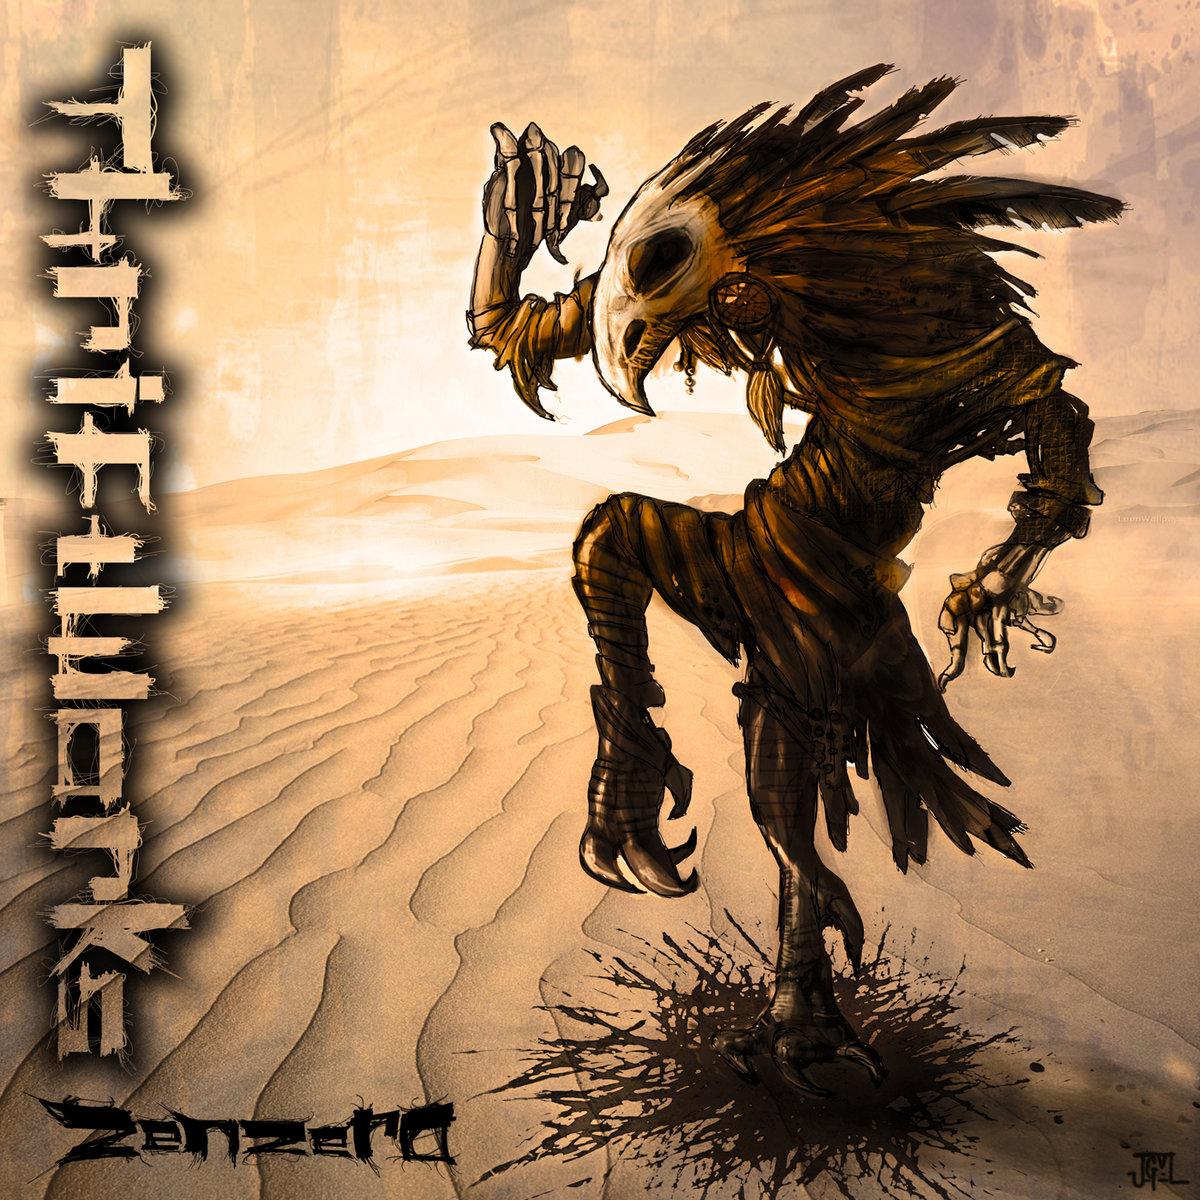 eenie meenie album cover